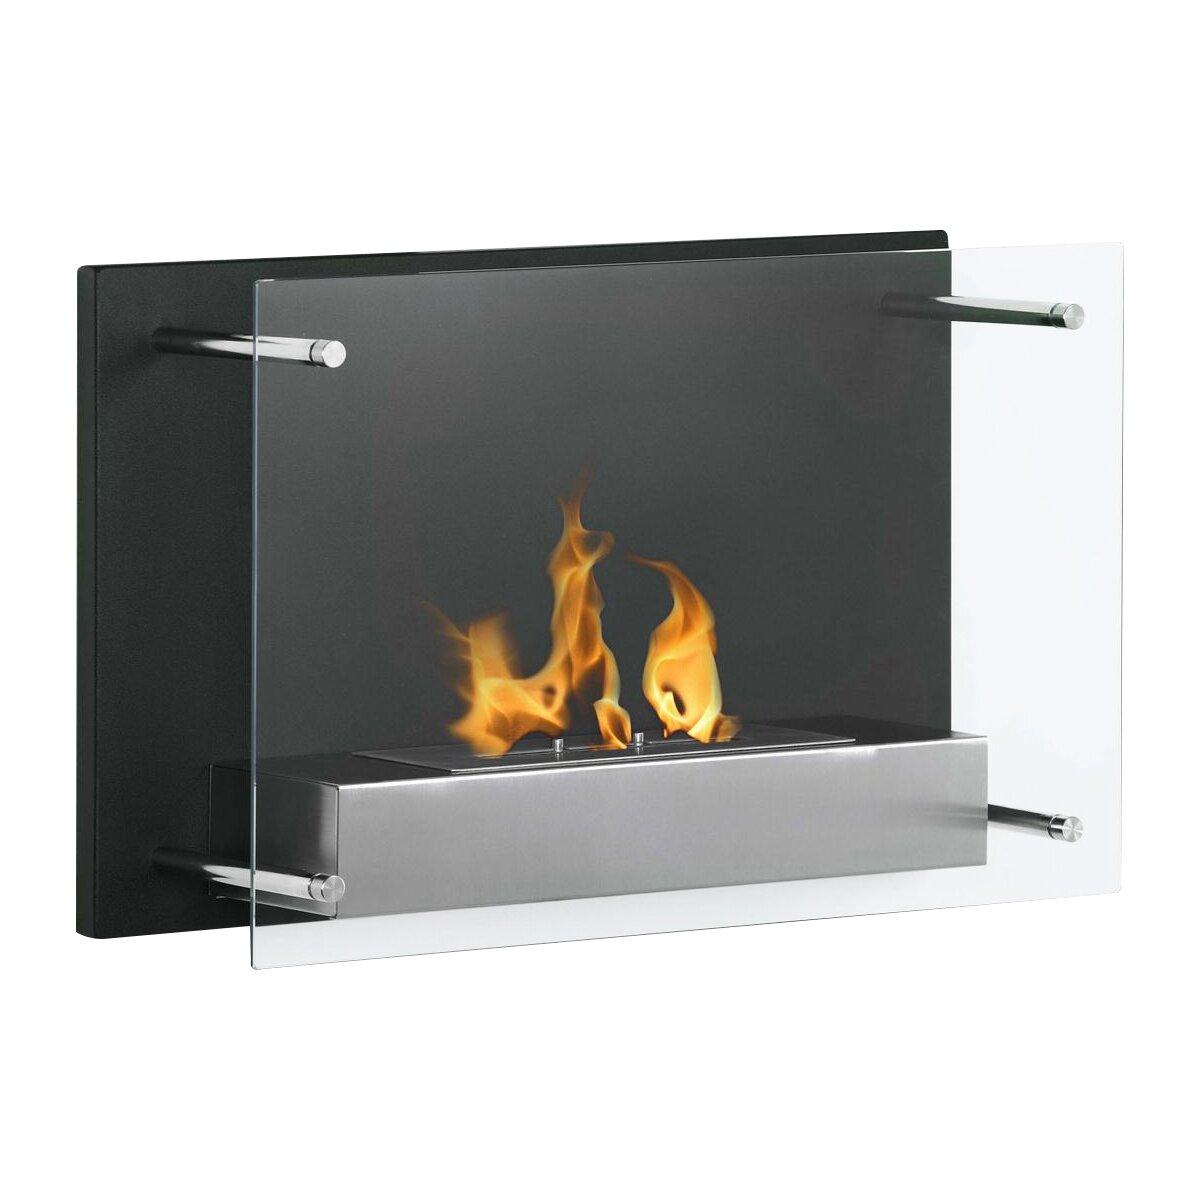 moda flame pro epila wall mount ethanol fireplace